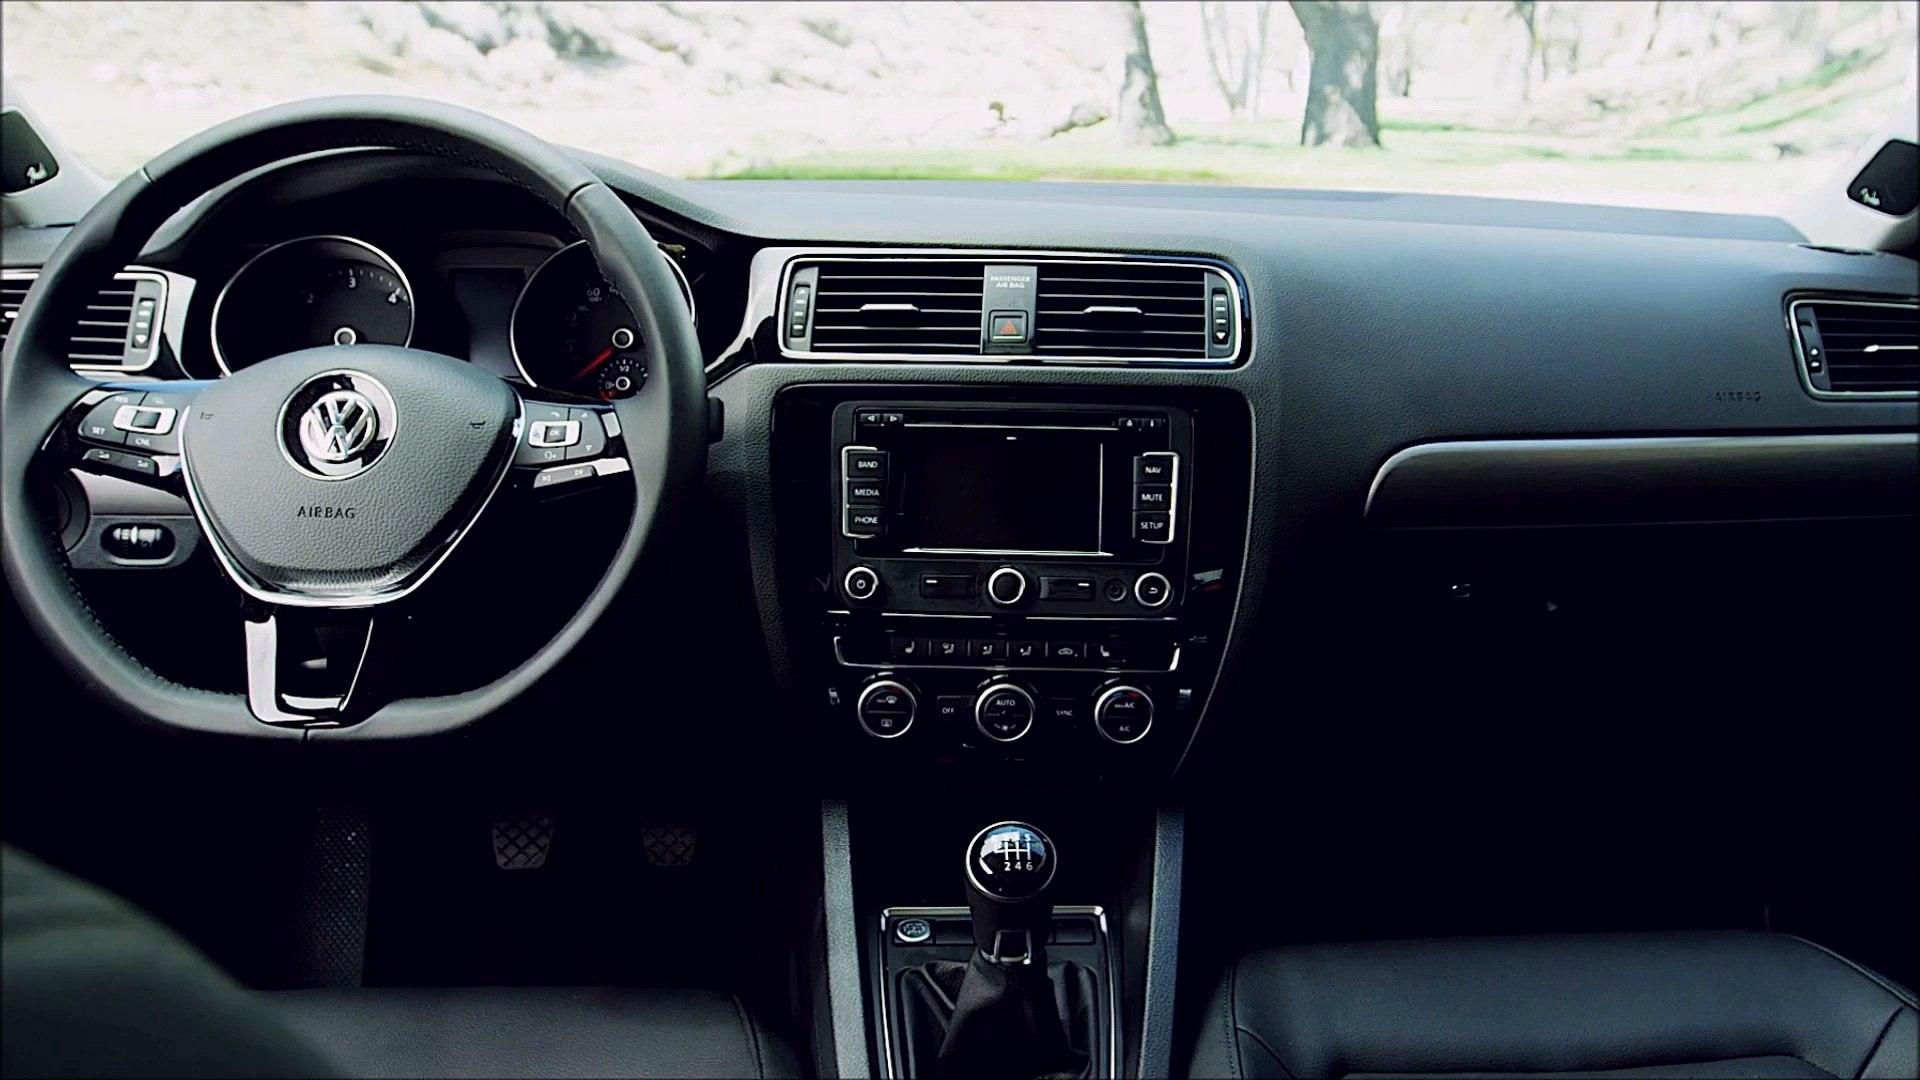 2015 Volkswagen Jetta Corona, CA | Volkswagen Jetta Corona, CA